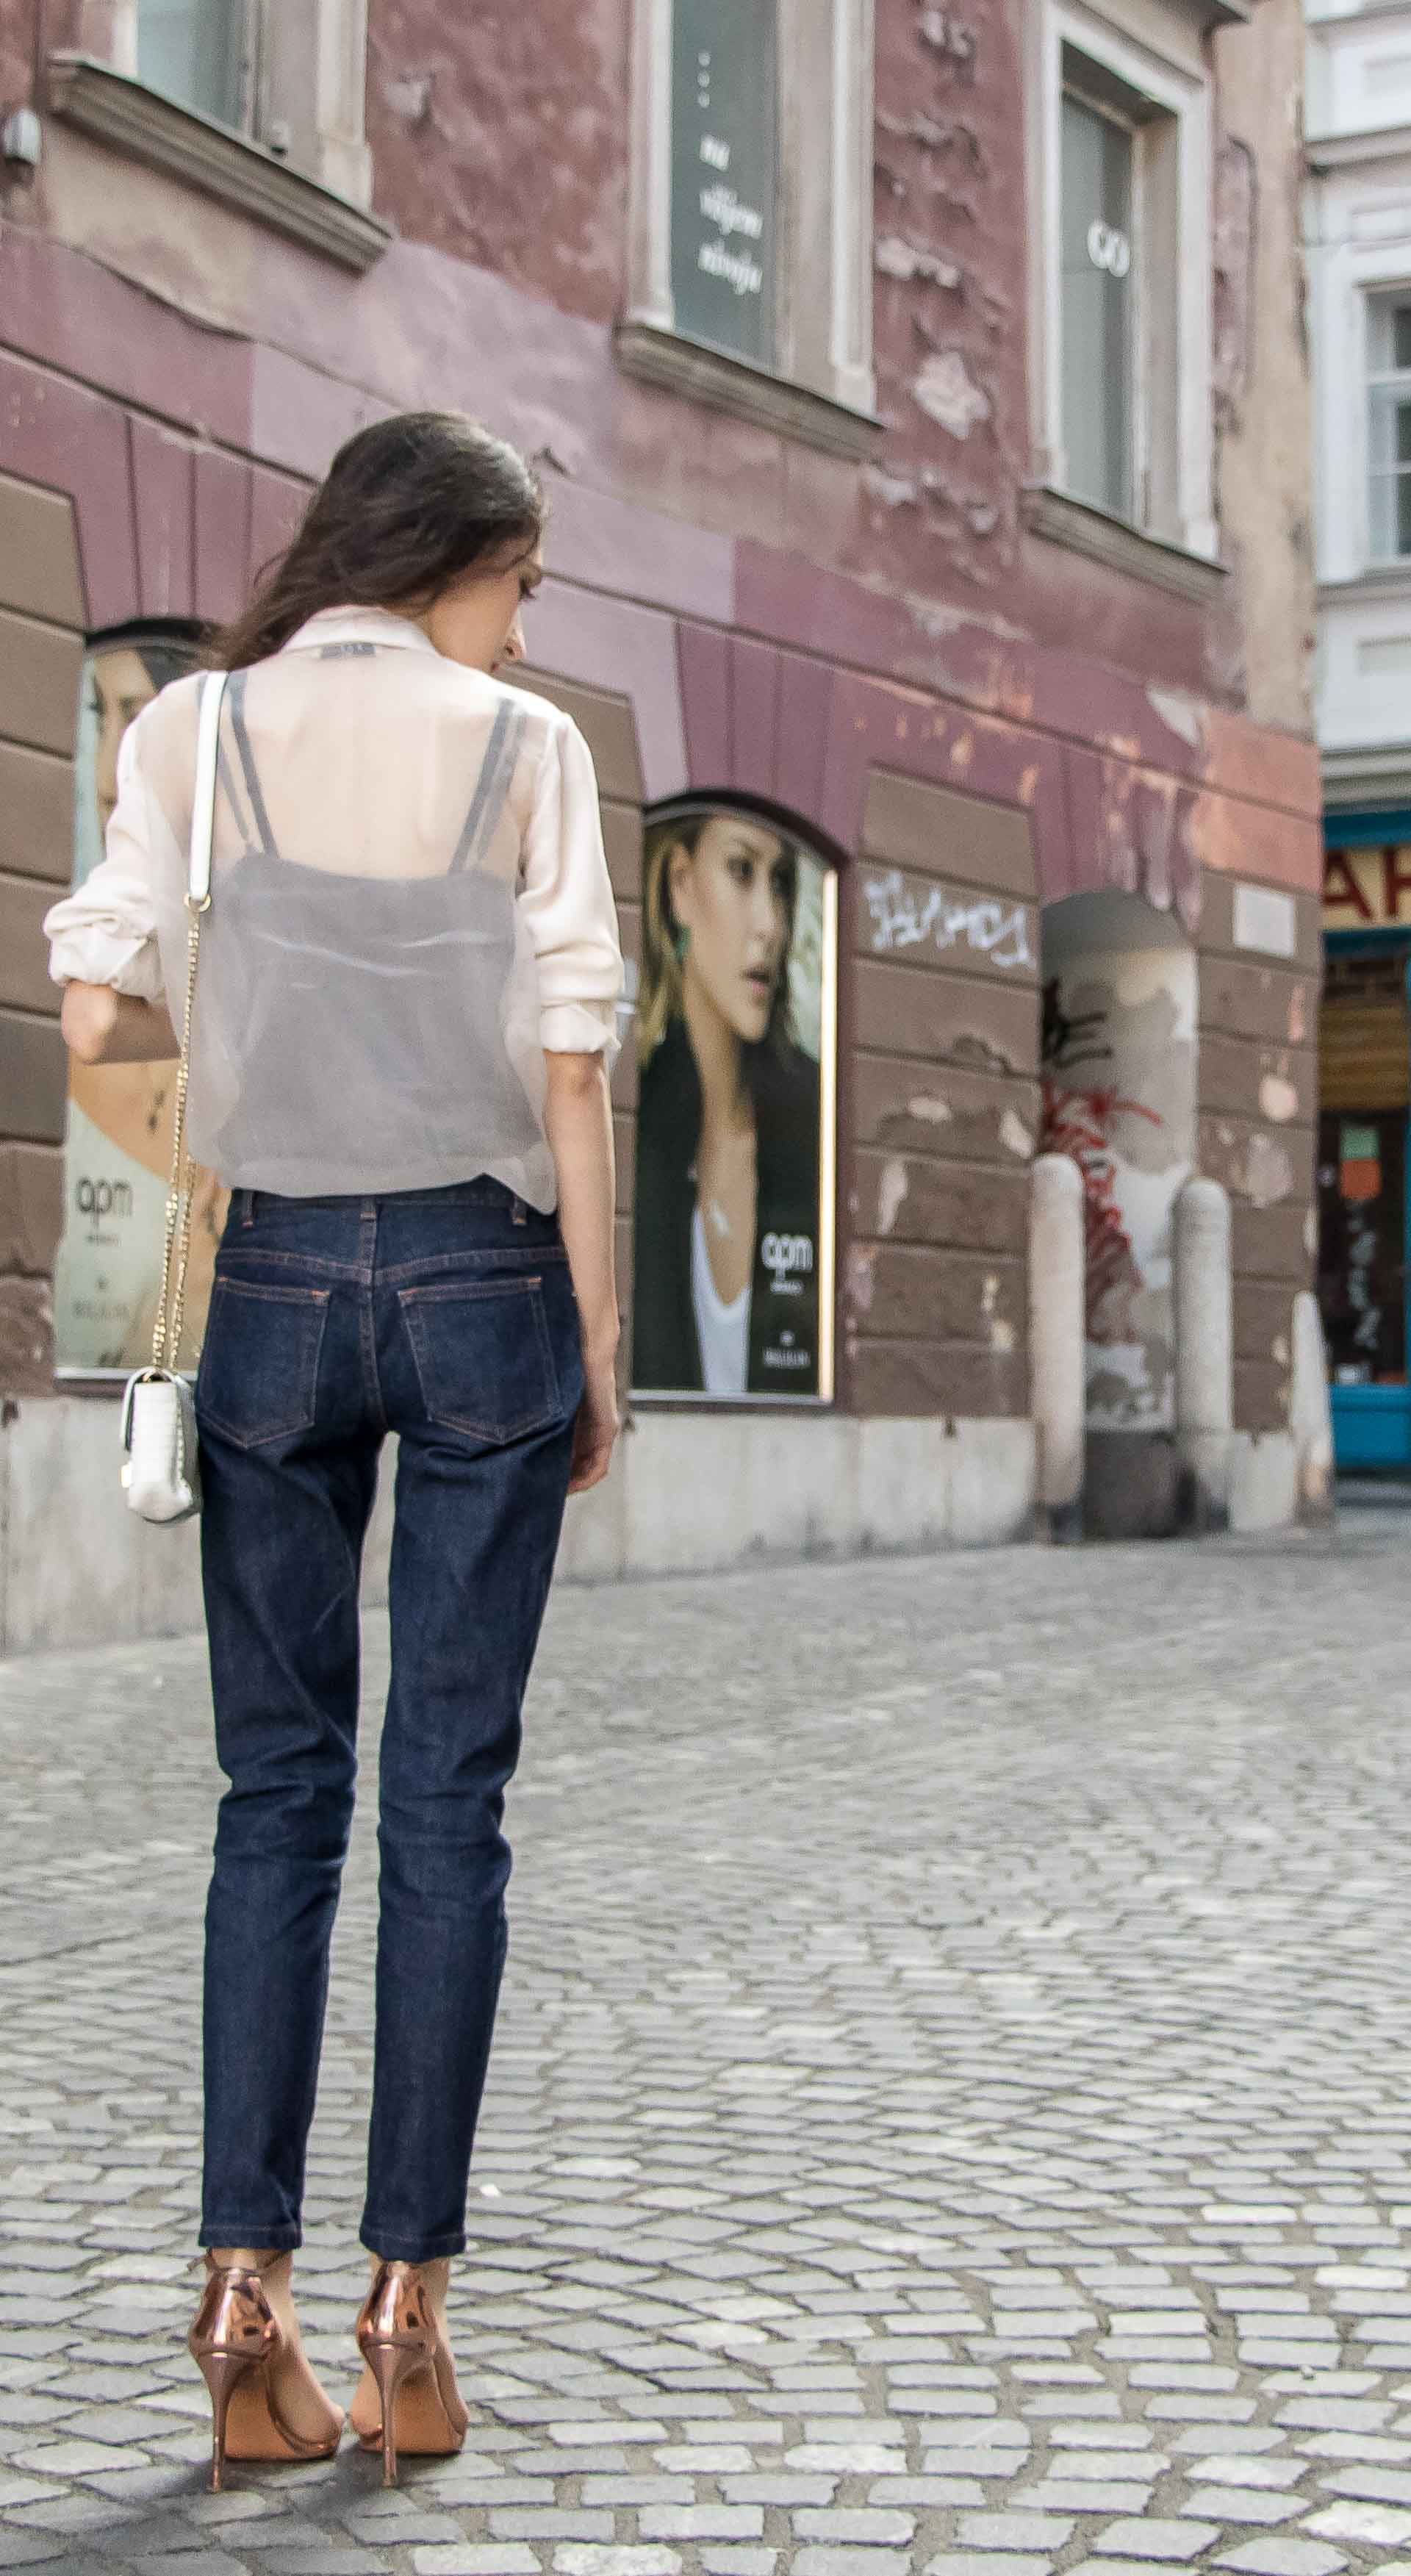 Beautiful Slovenian Fashion Blogger Veronika Lipar of Brunette from Wall wearing chic outfit, white silk shirt from Sandro Paris, A.P.C. straight-leg dark denim jeans, Stuart Weitzman Nudistsong metallic sandals, chain shoulder bag showing back